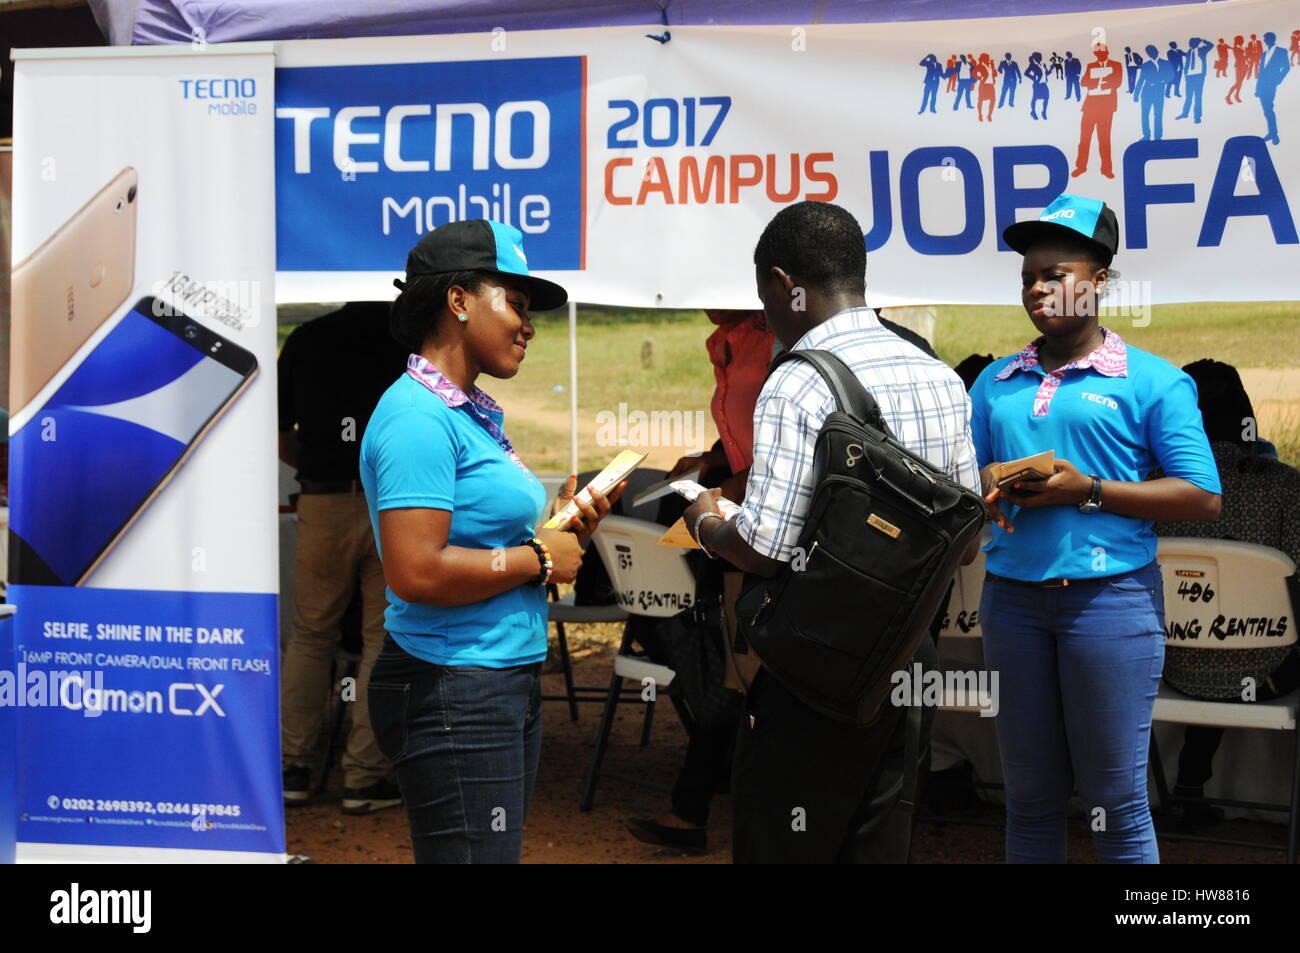 Tecno Stock Photos & Tecno Stock Images - Alamy